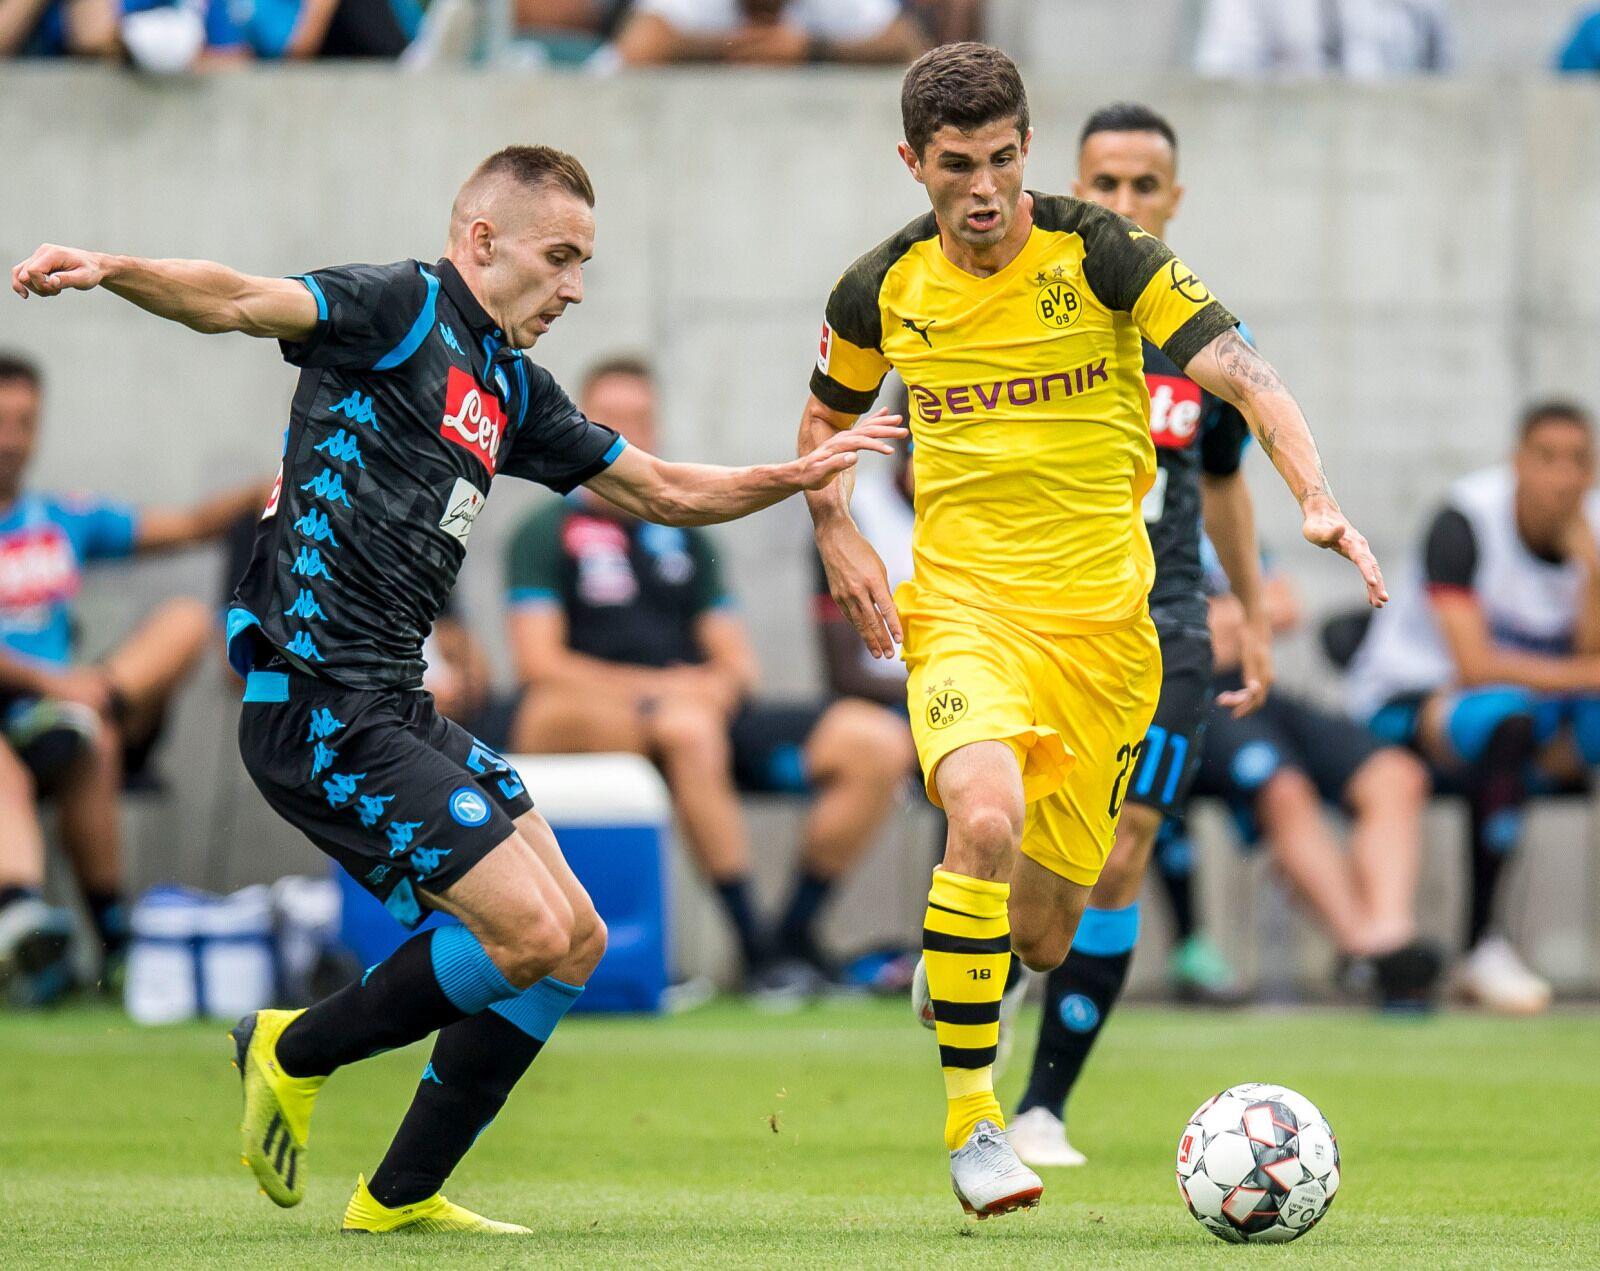 Borussia Dortmund Vs Nurnberg Live Stream Watch Bundesliga Online